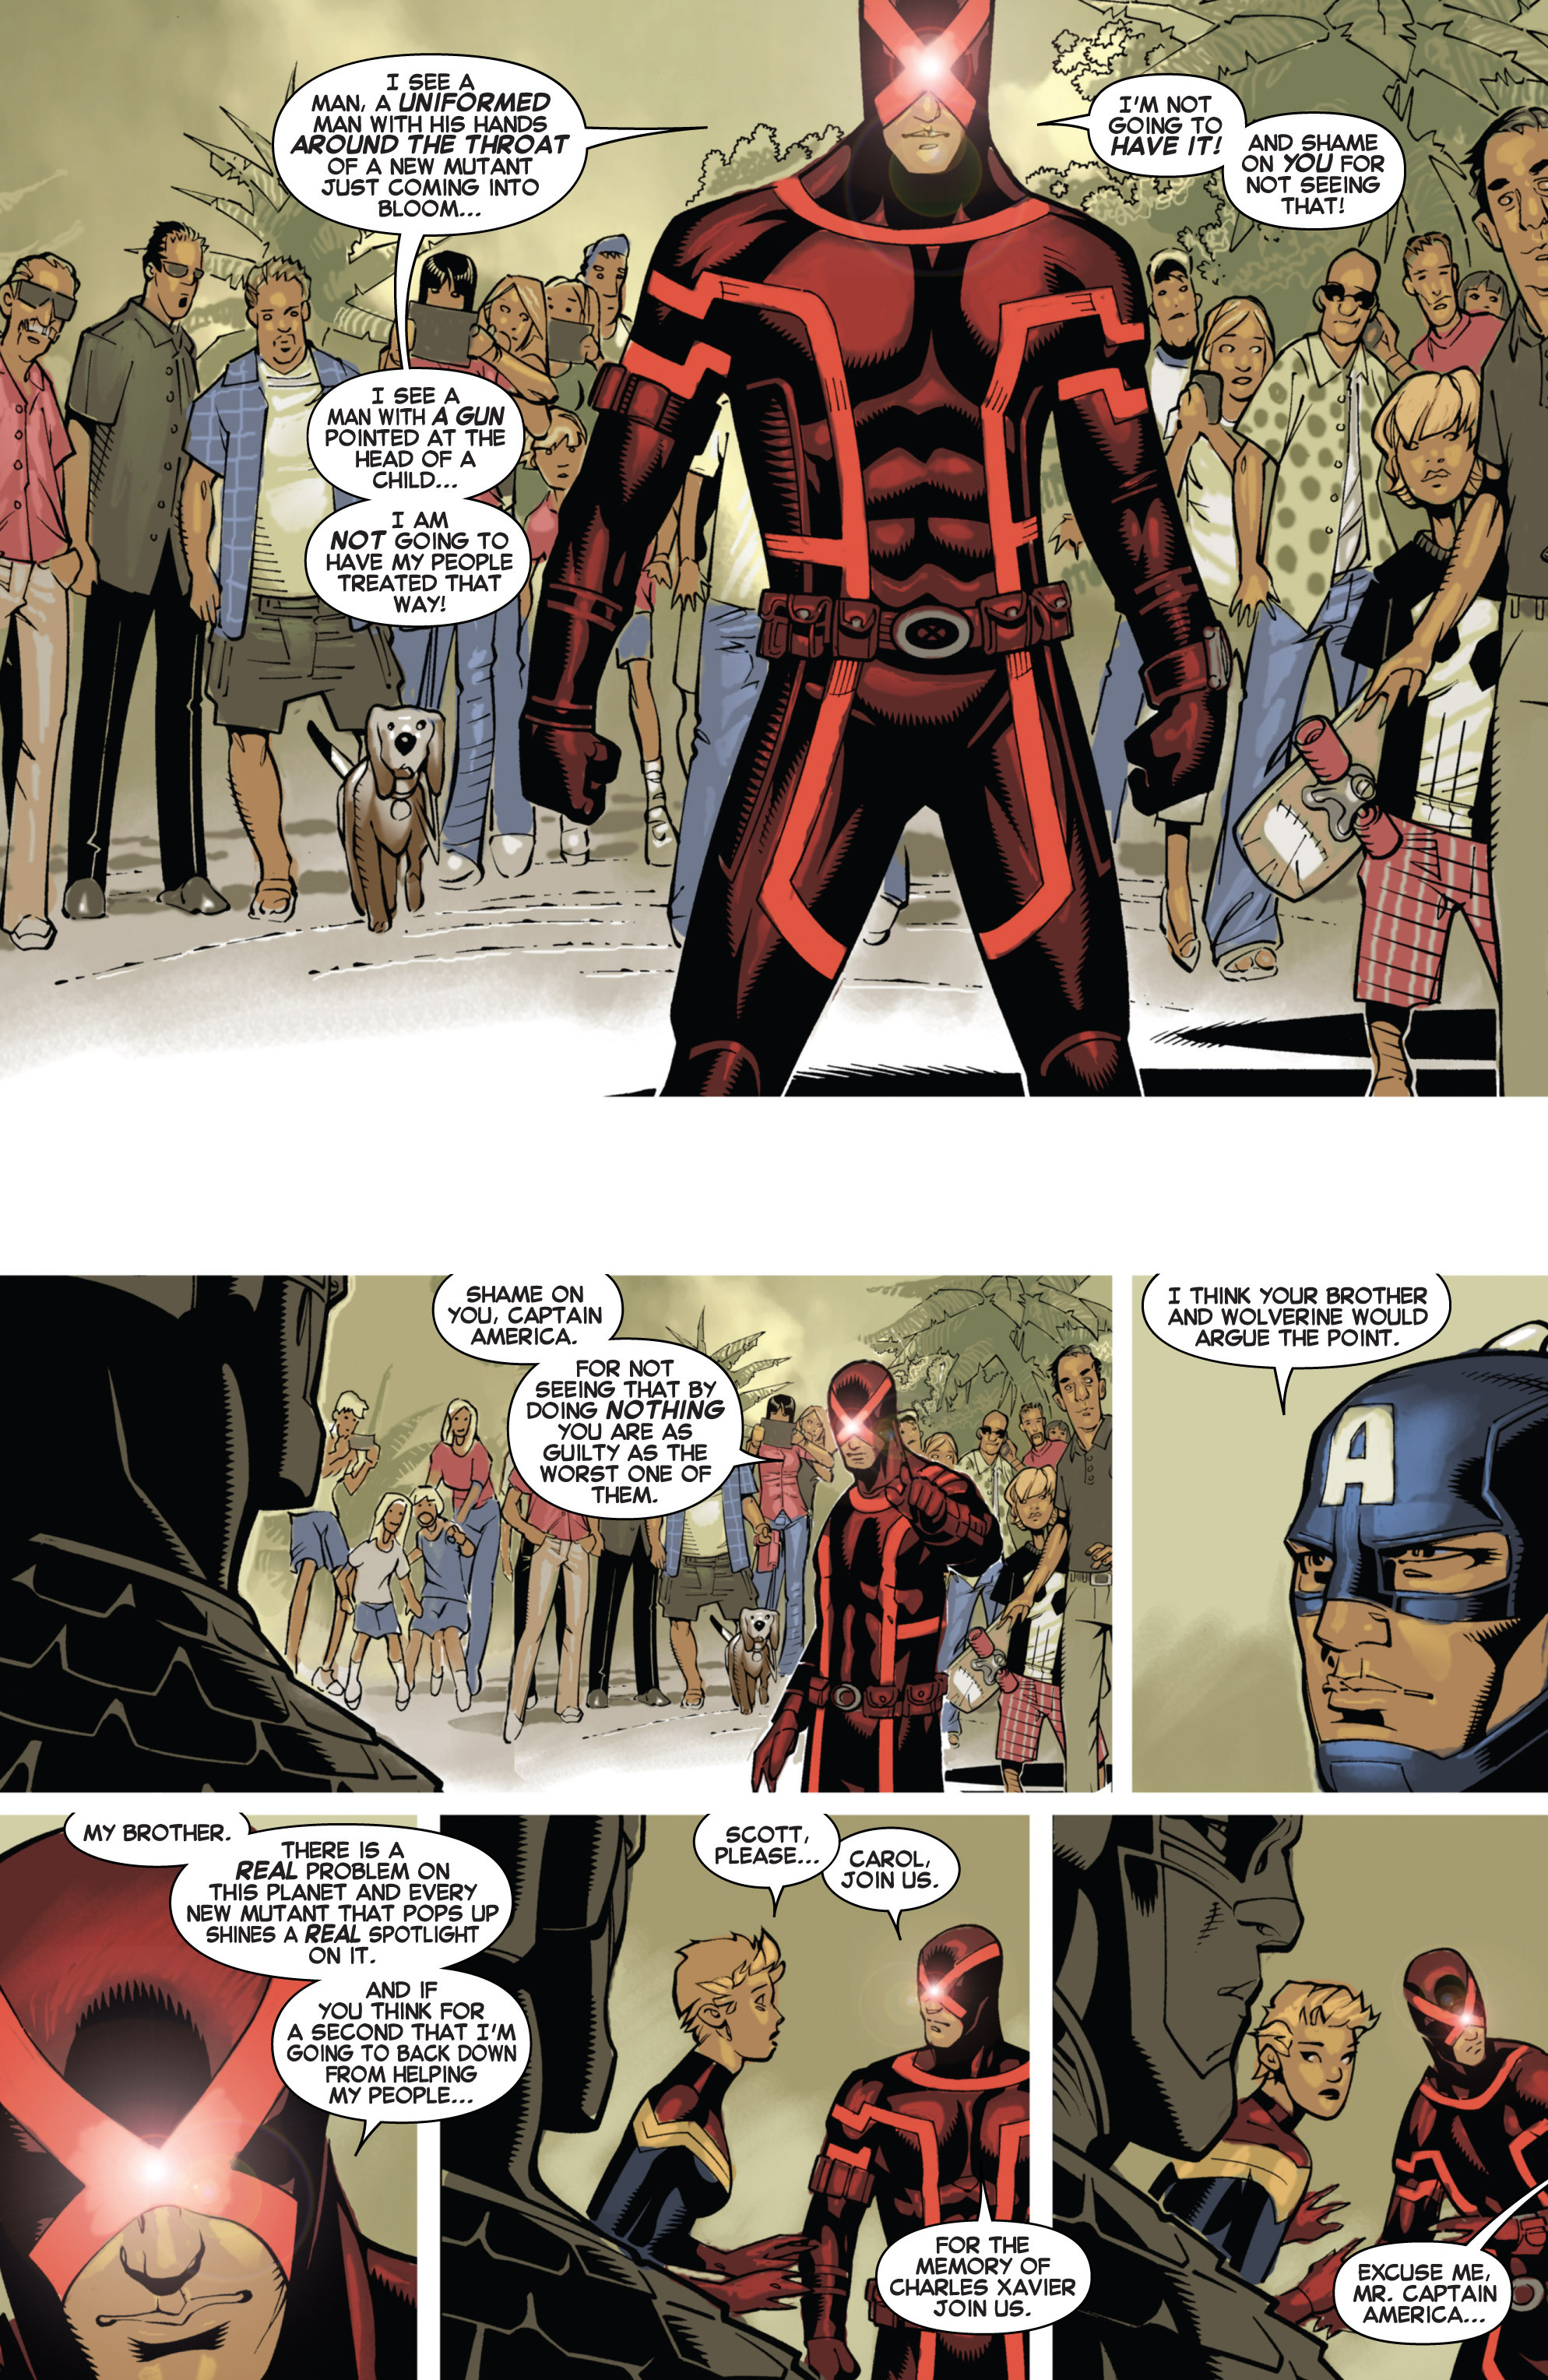 Read online Uncanny X-Men (2013) comic -  Issue # _TPB 1 - Revolution - 52